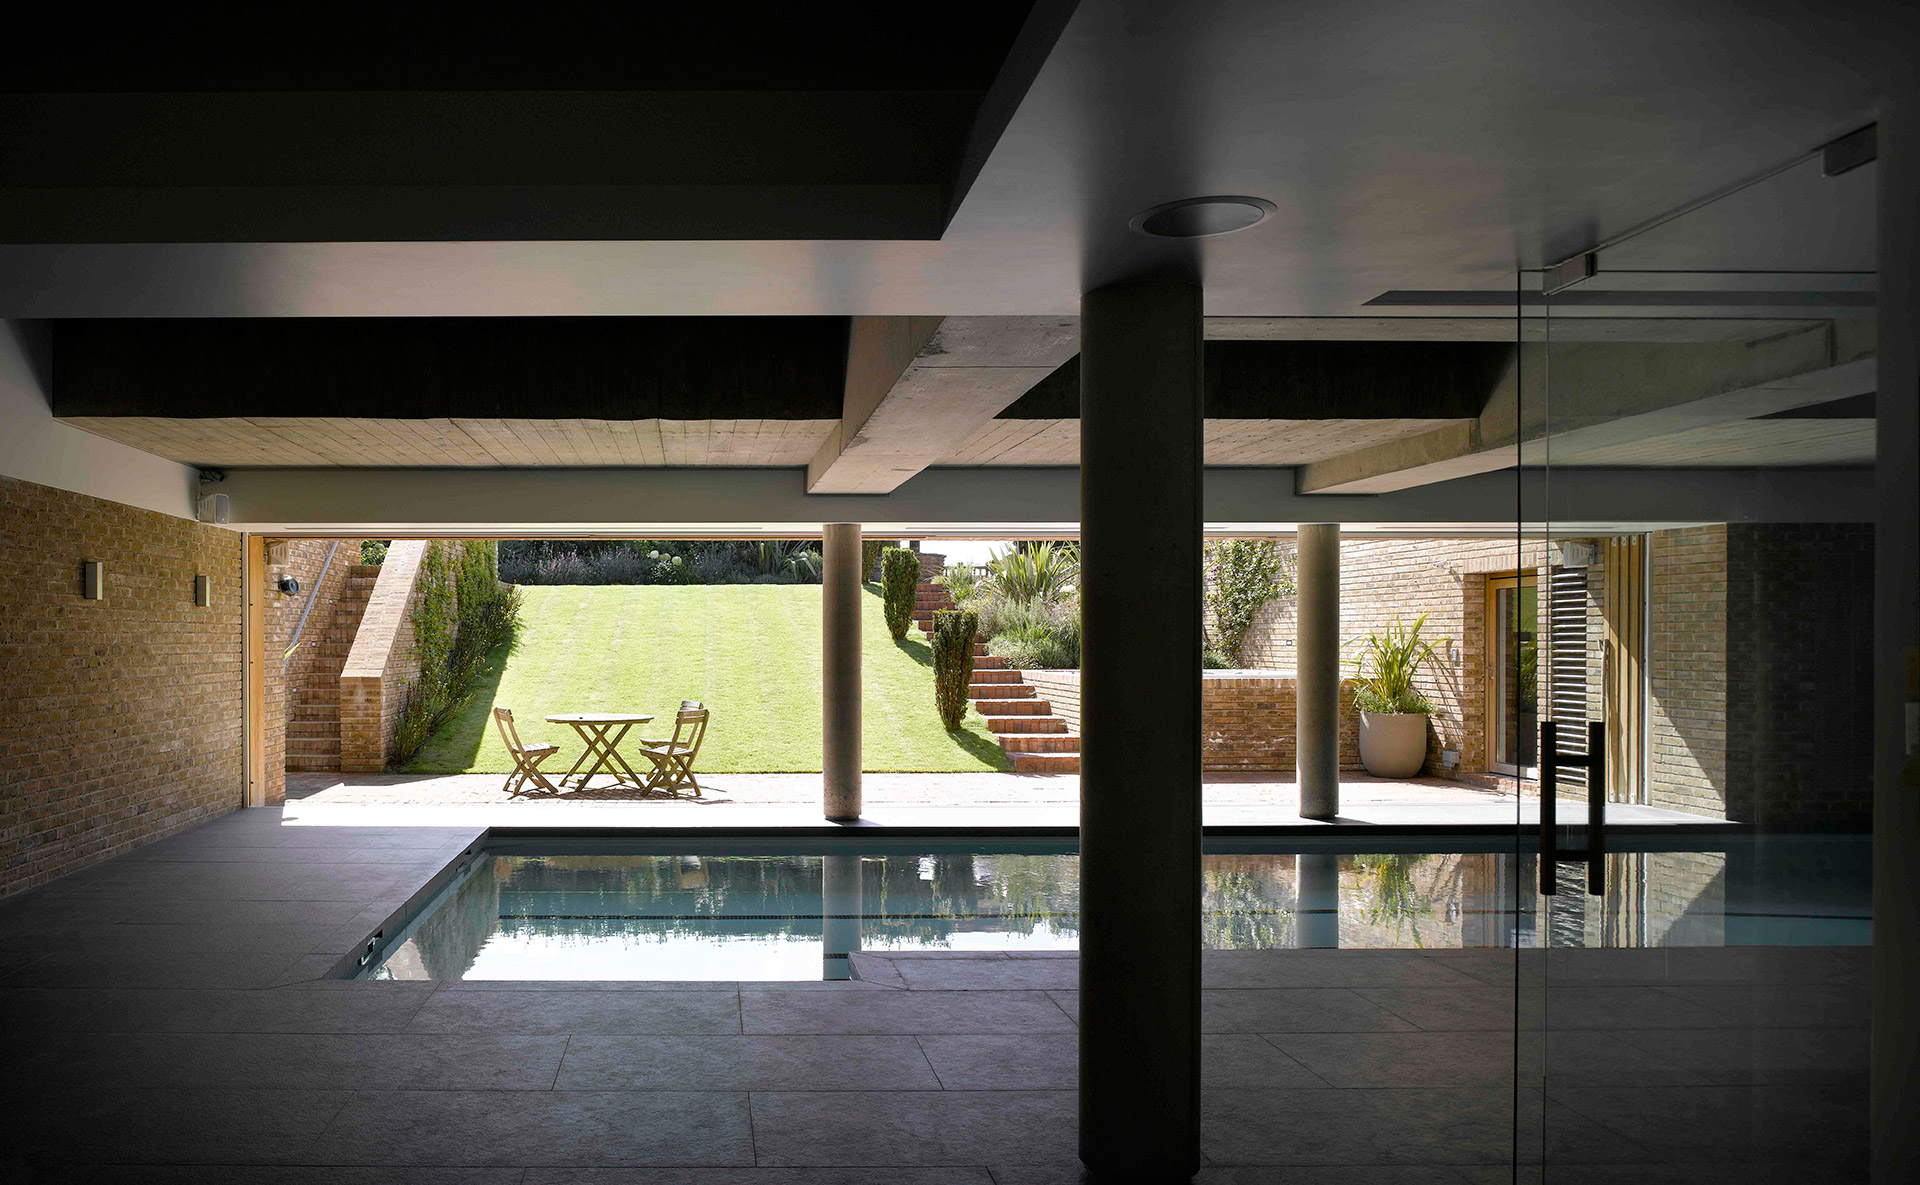 Andrew Ohl Associates - Merrow